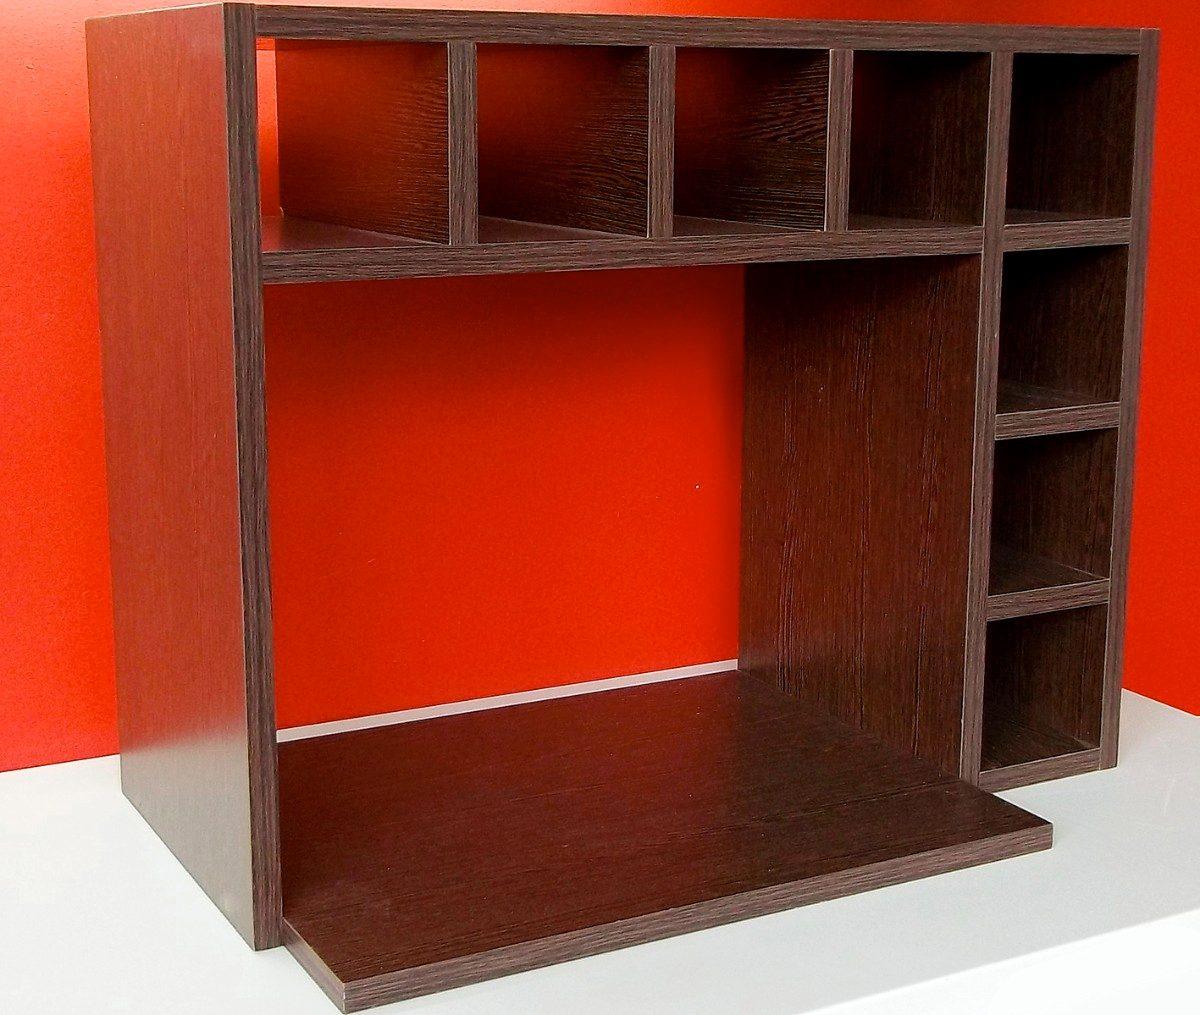 Muebles para vinoteca para living adems vinoteca vicave - Mueble para microondas ...